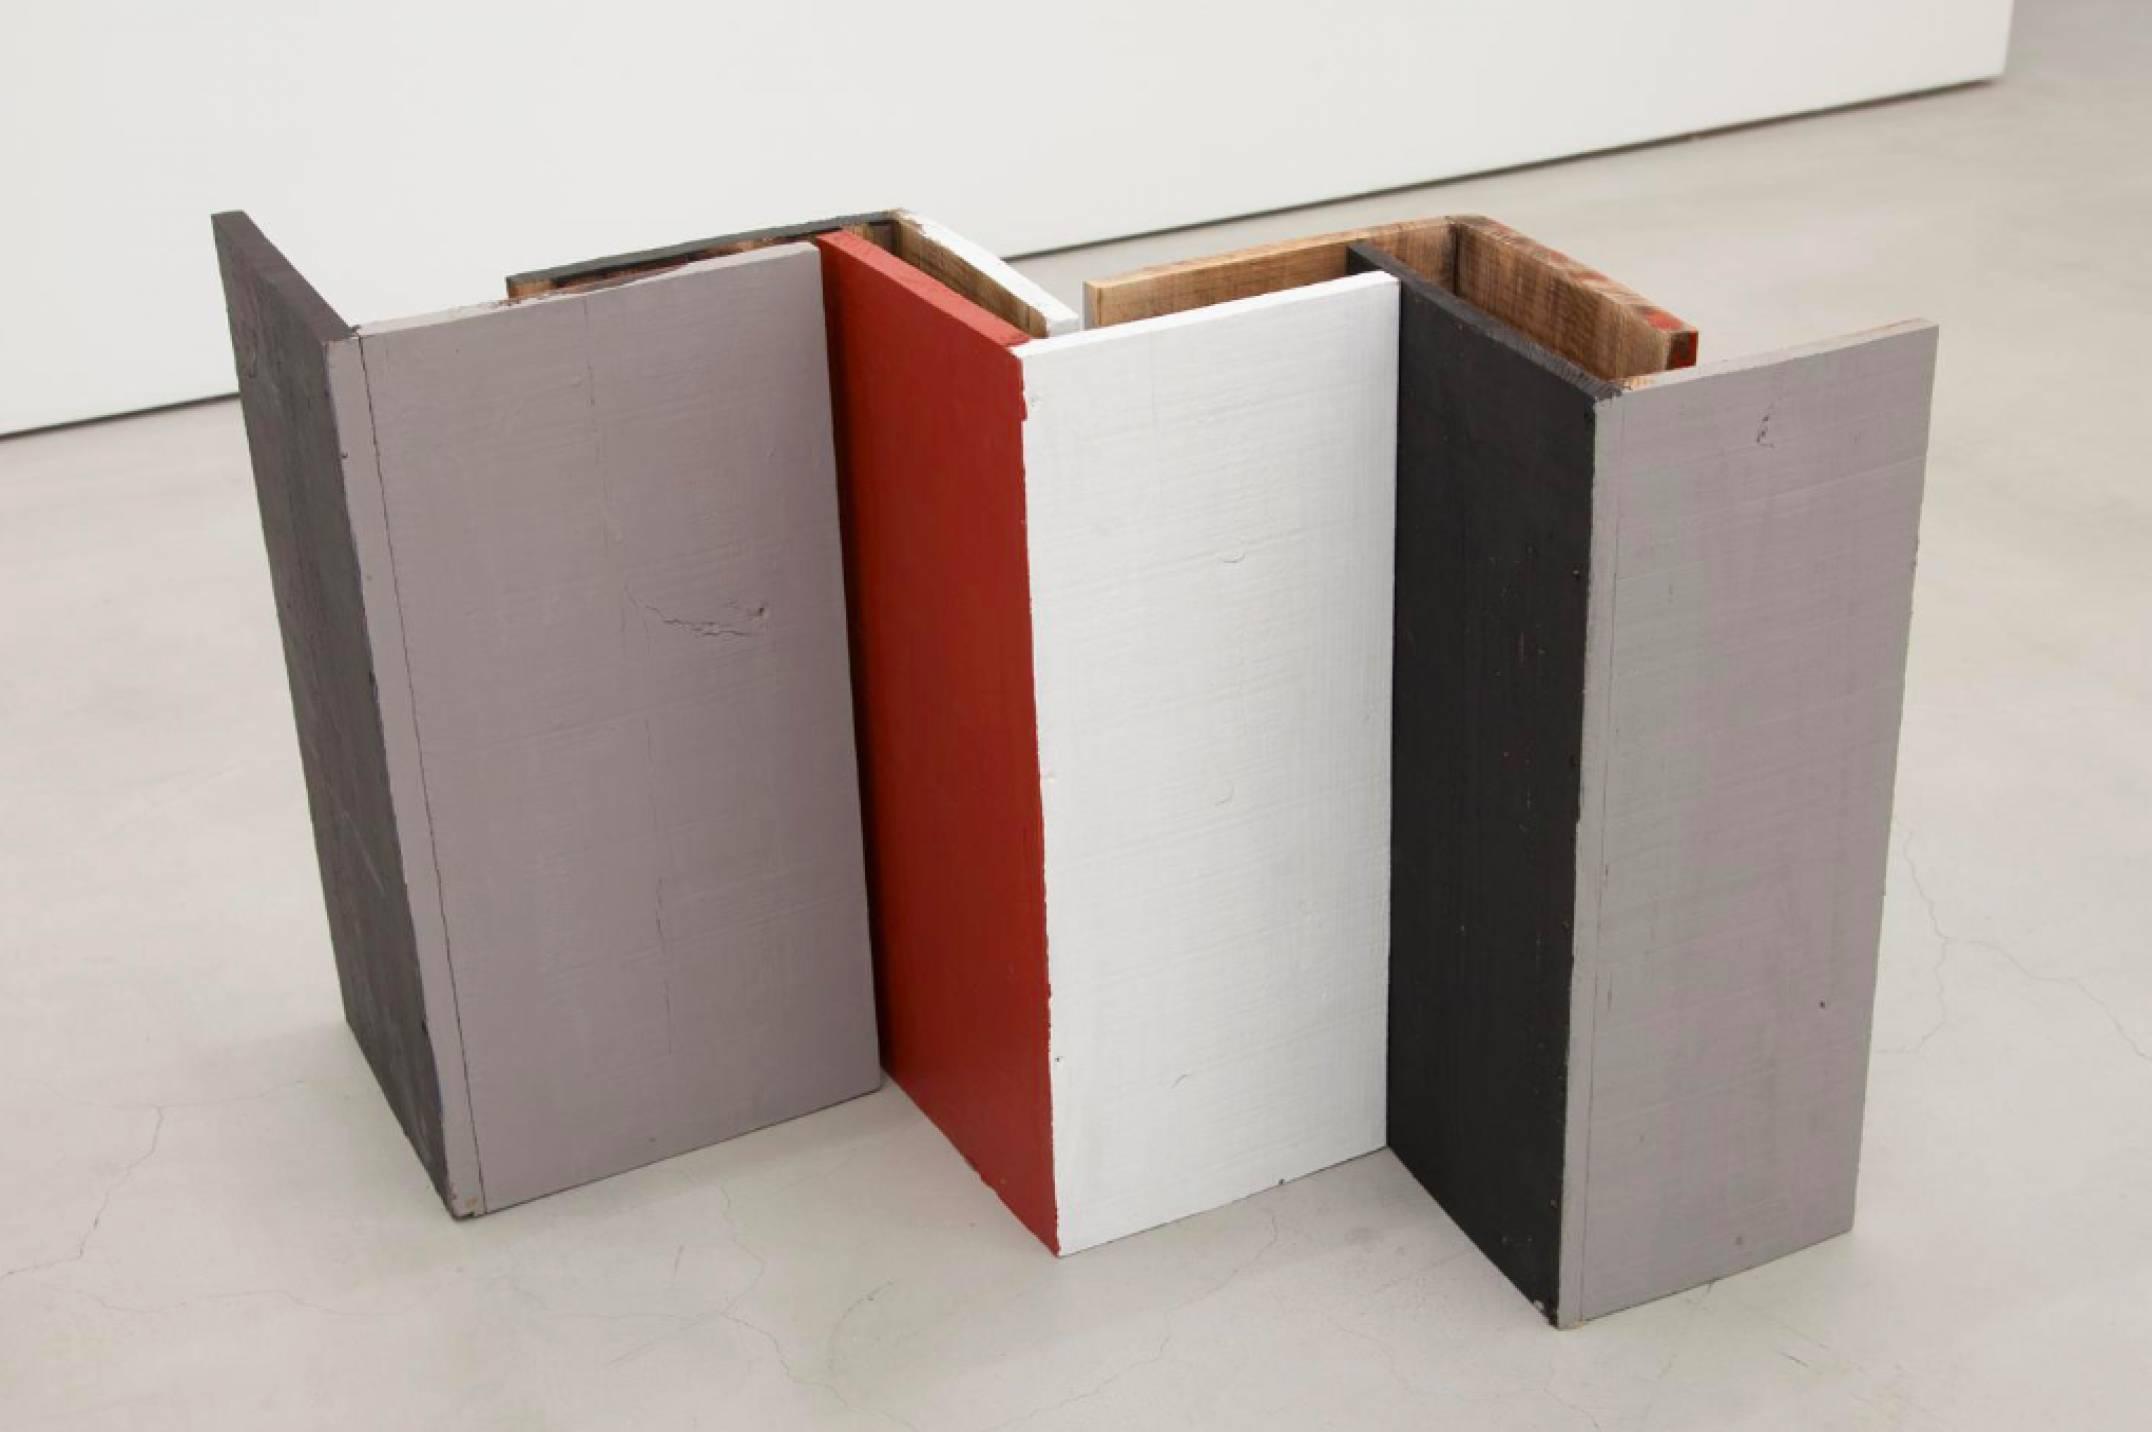 Kishio Suga,<em>Standing Perimeter, Occupied Center</em>, 1986, plywood, water-based paint, variable dimensions - Mendes Wood DM